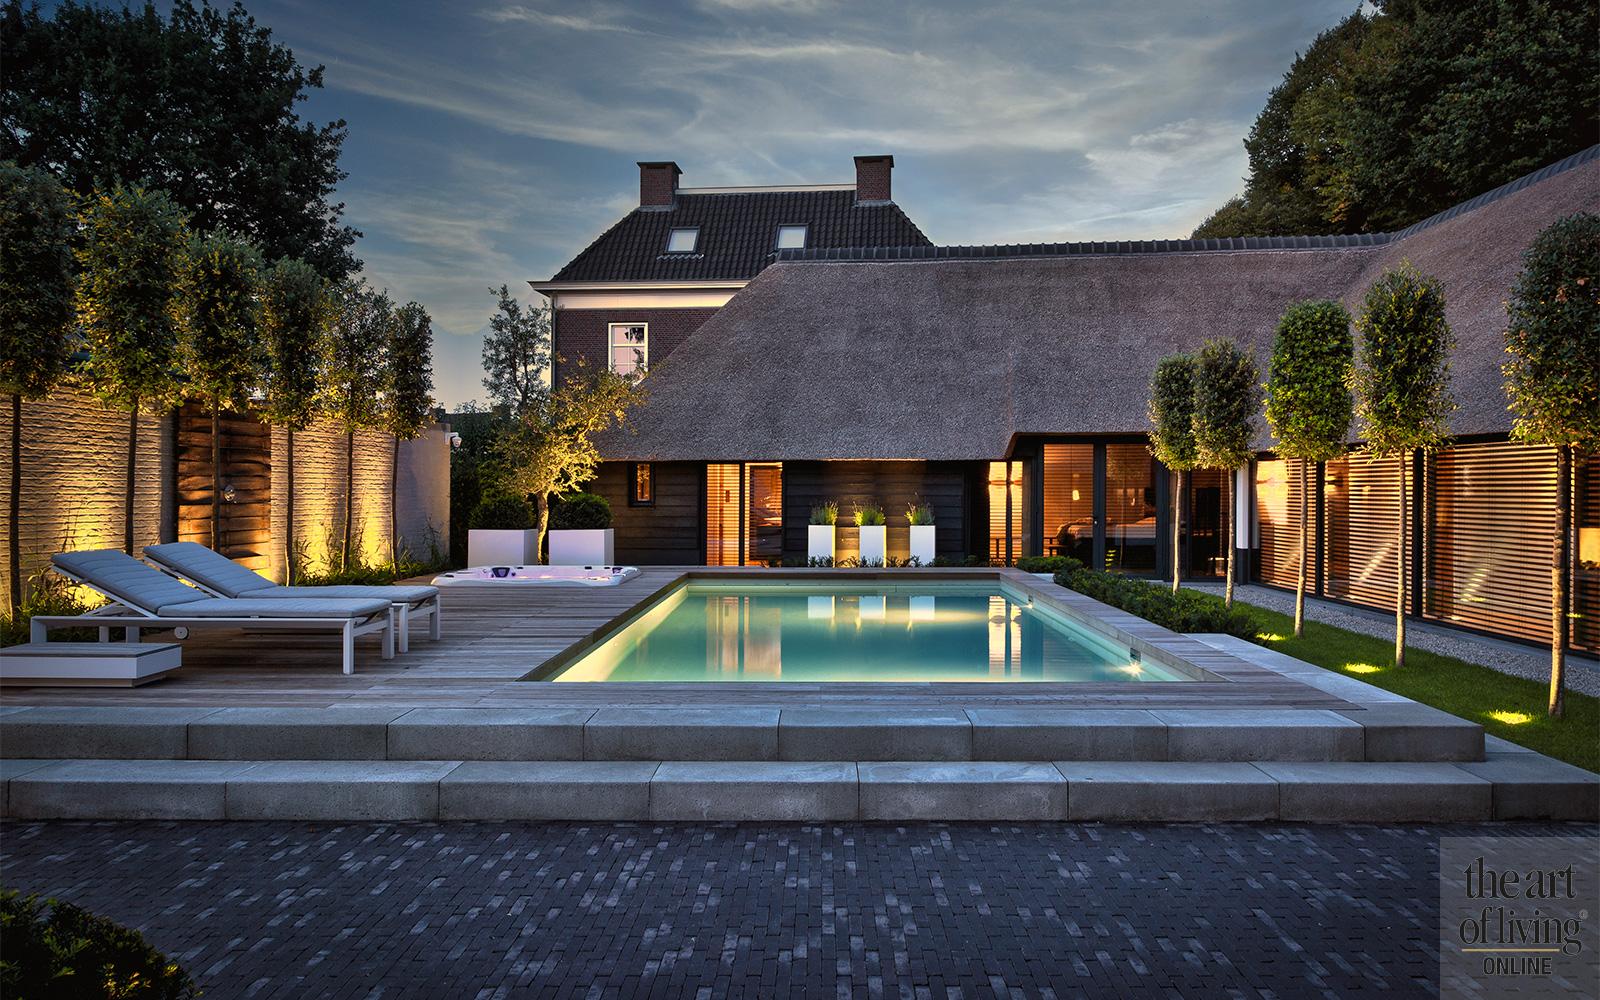 Totaal architectuur, uniek landhuis, ZOUT Ontwerphuis, Vermeer Architecten, Knops Tuindesign, tuinarchitectuur